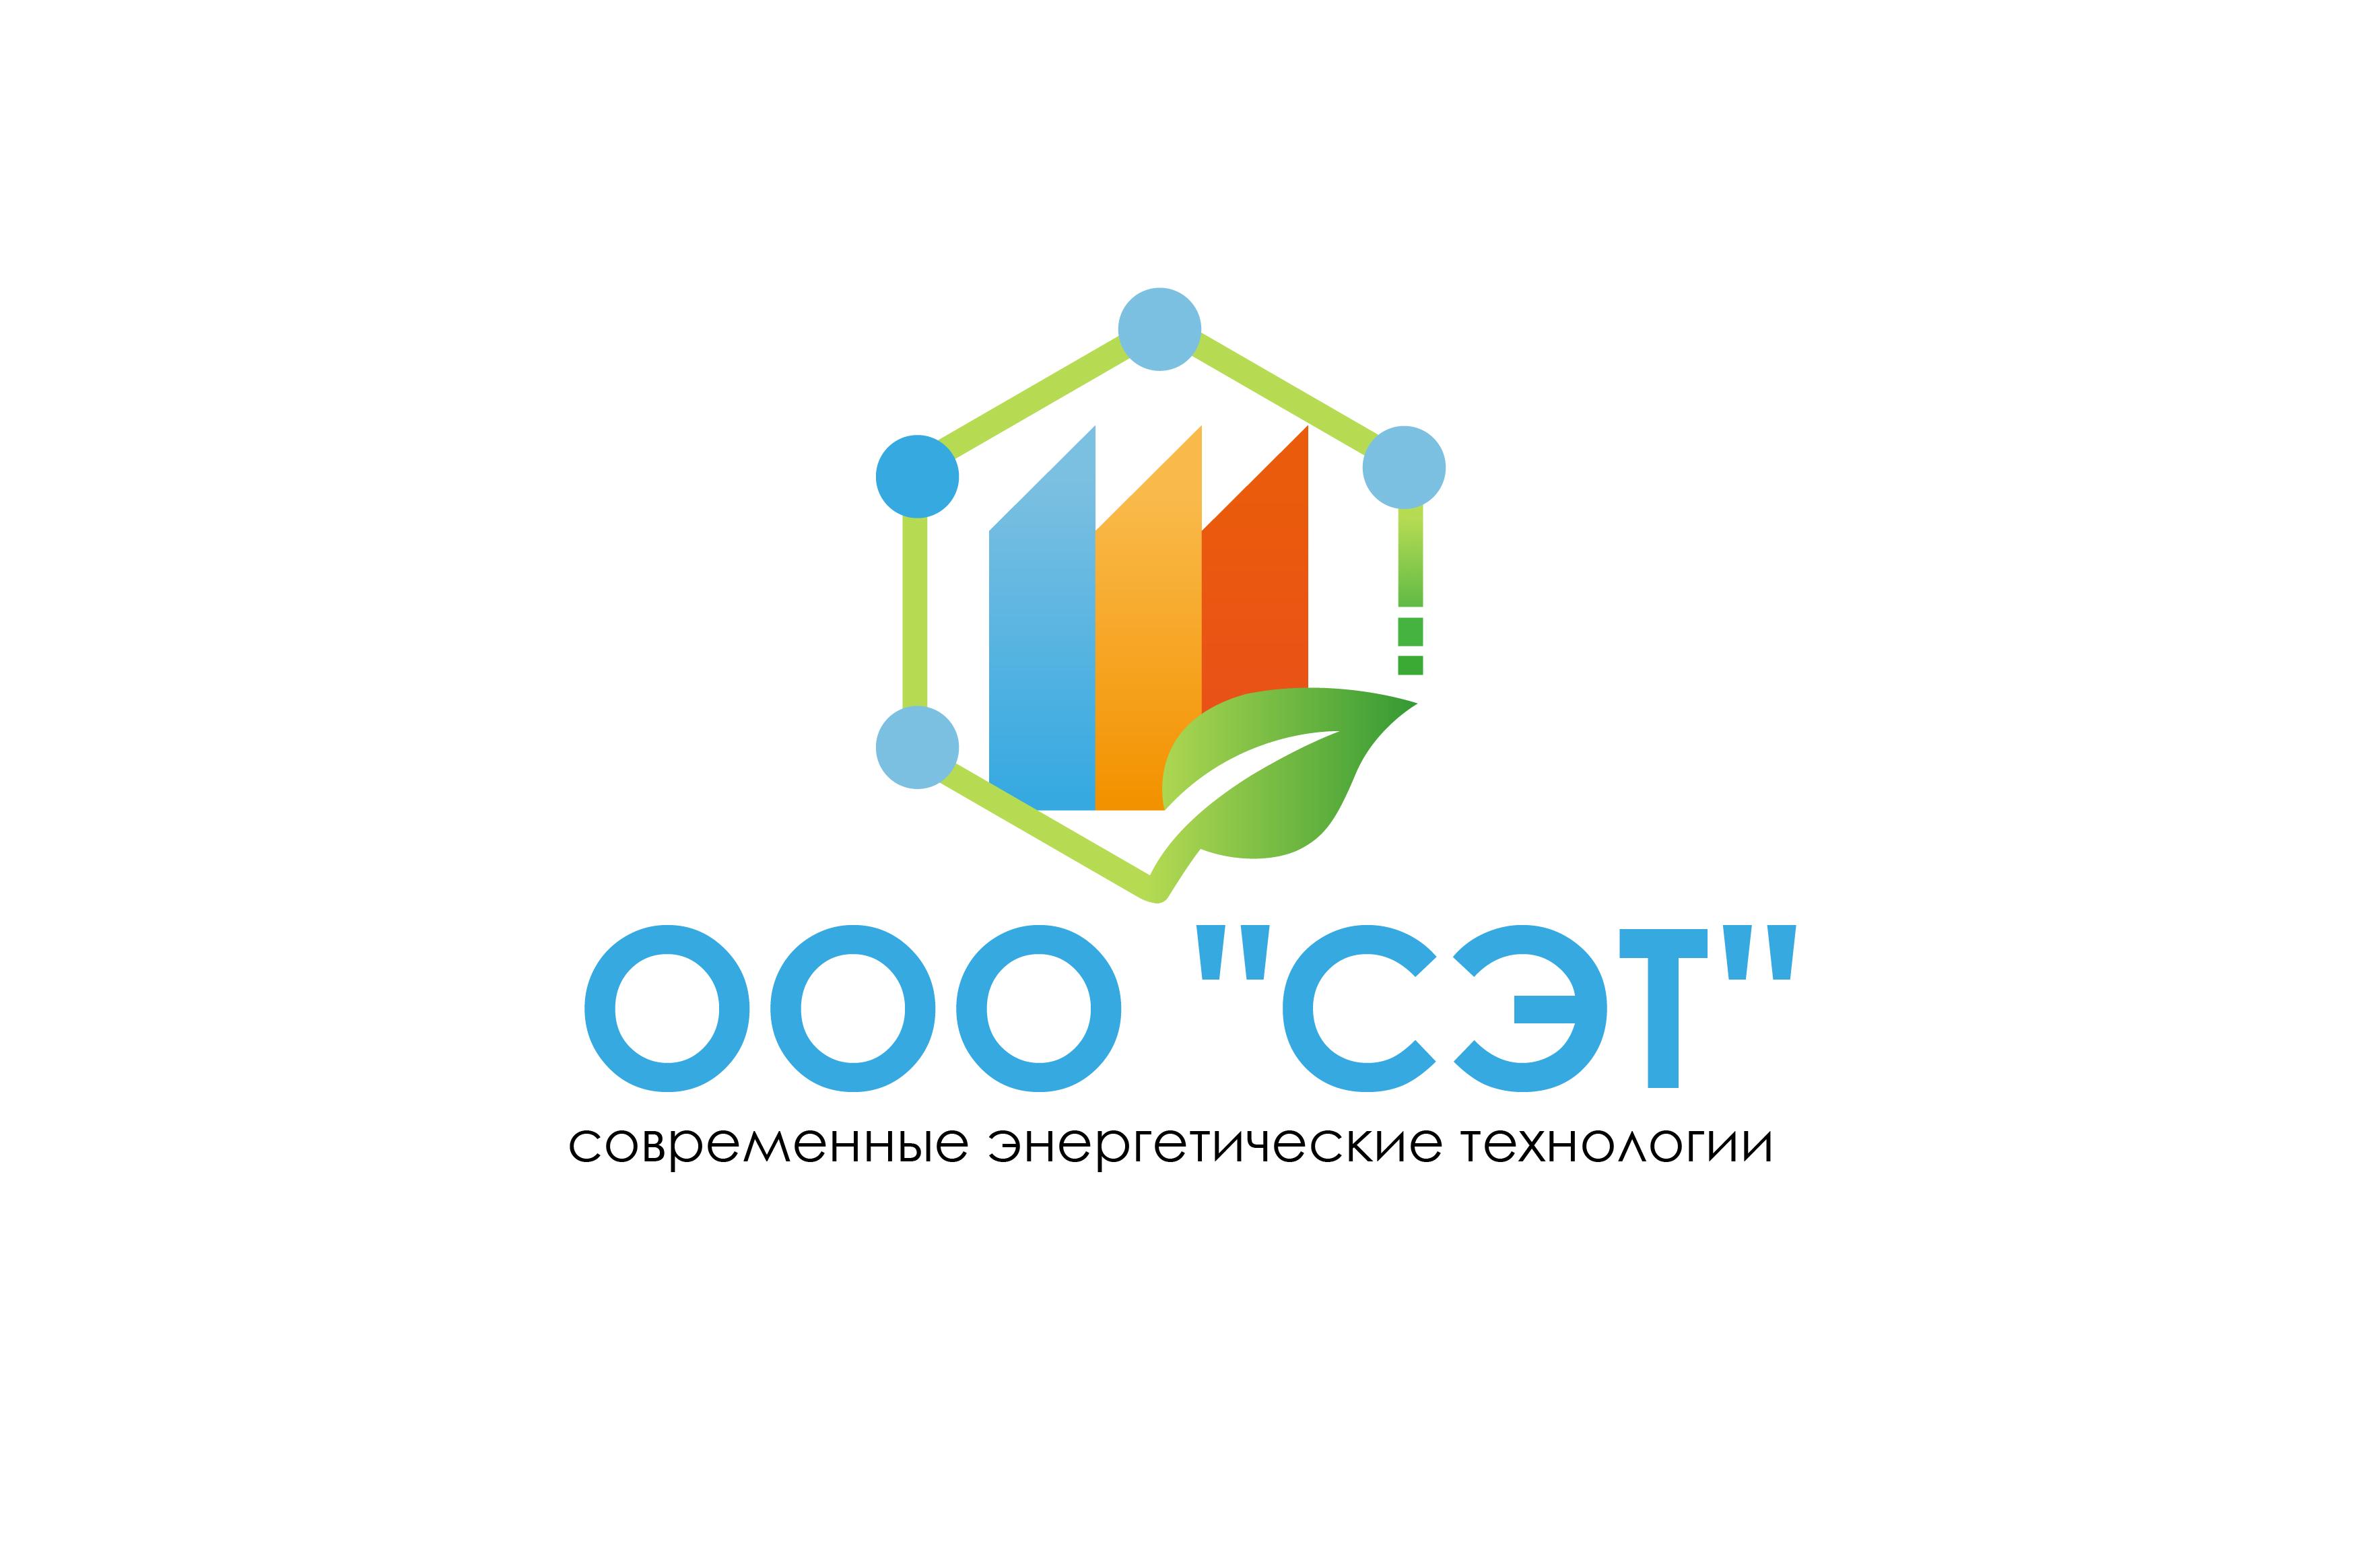 Срочно! Дизайн логотипа ООО «СЭТ» фото f_7955d4c1b53c0a27.jpg